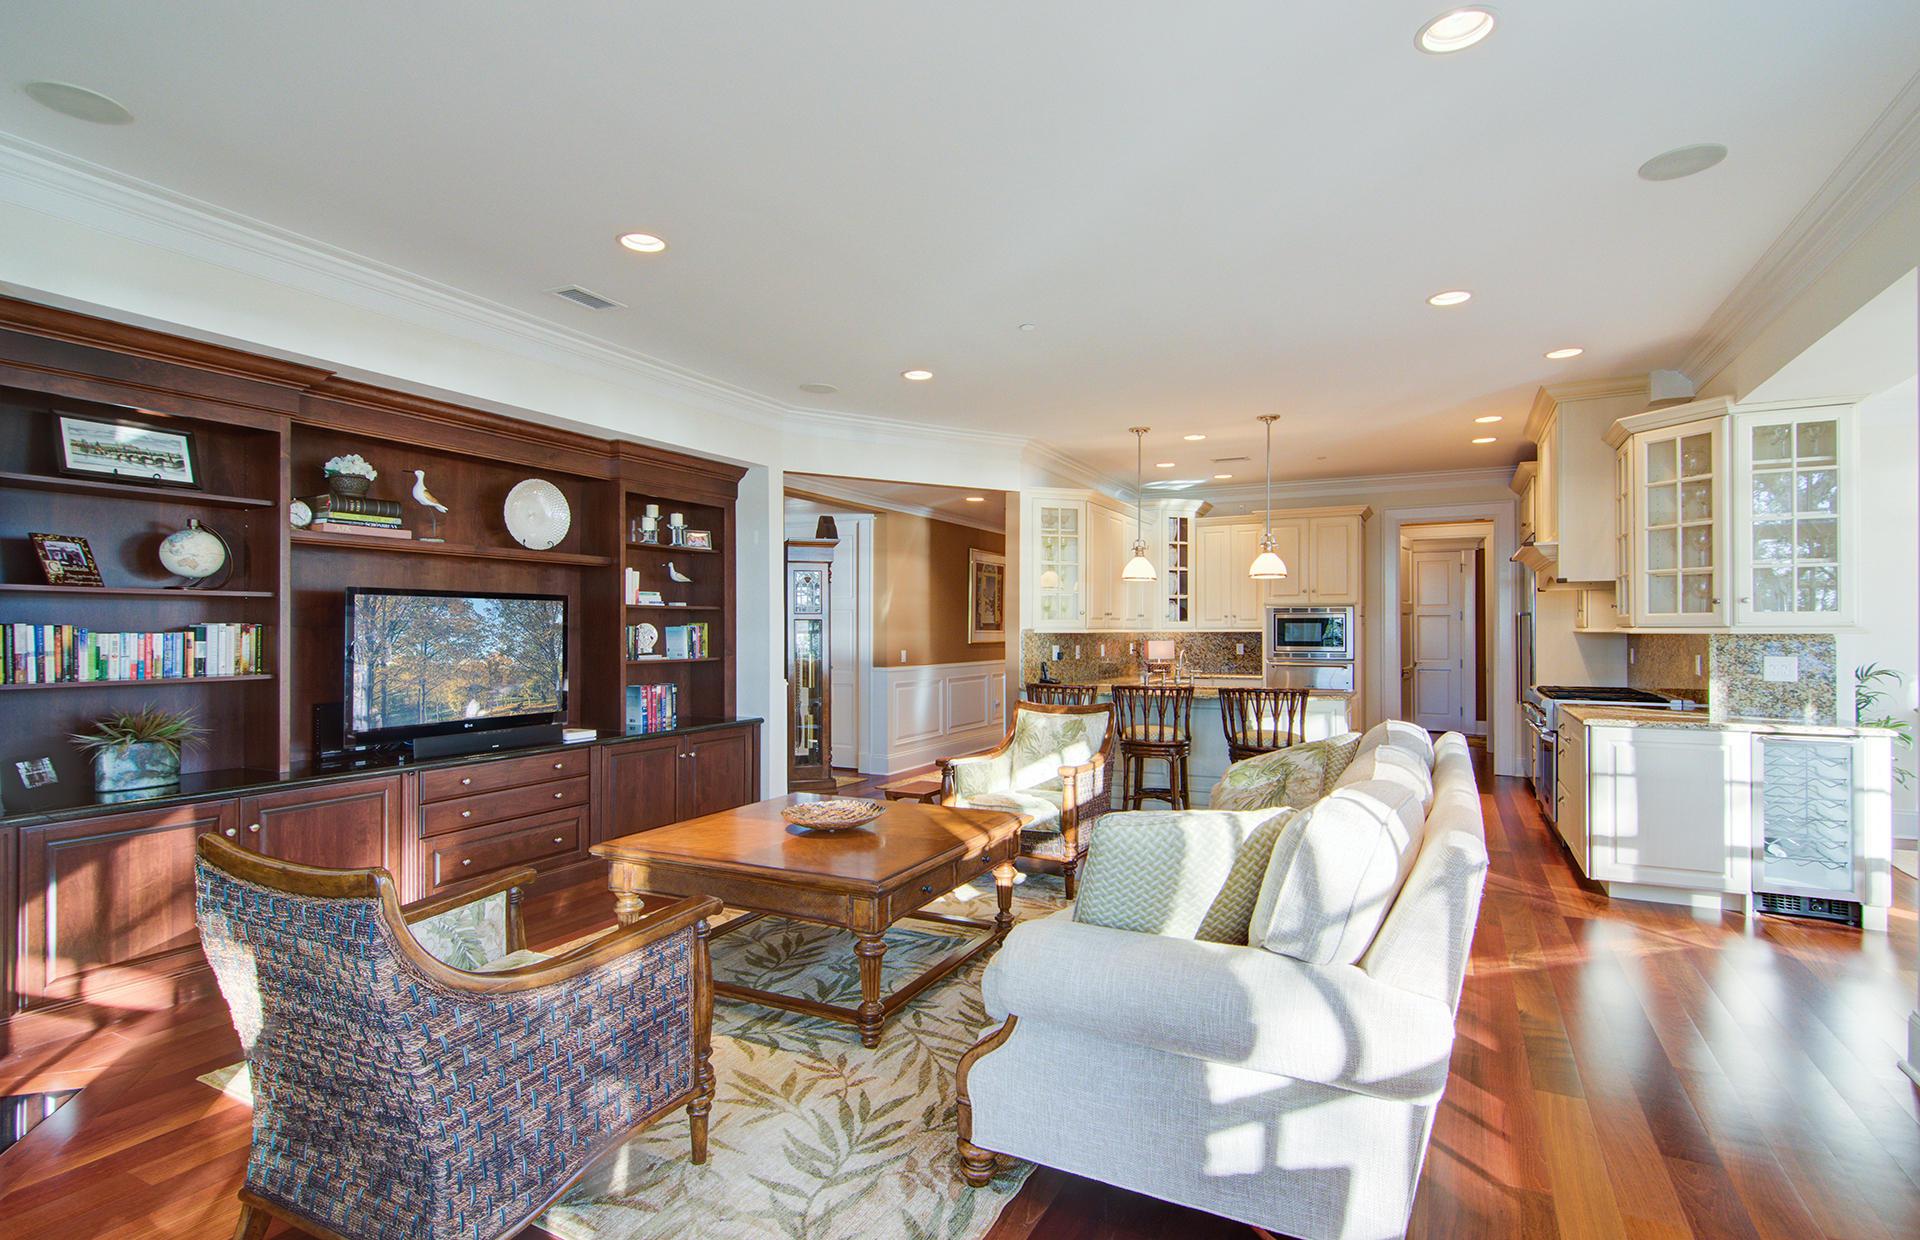 Daniel Island Homes For Sale - 134 Fairbanks Oak, Charleston, SC - 55